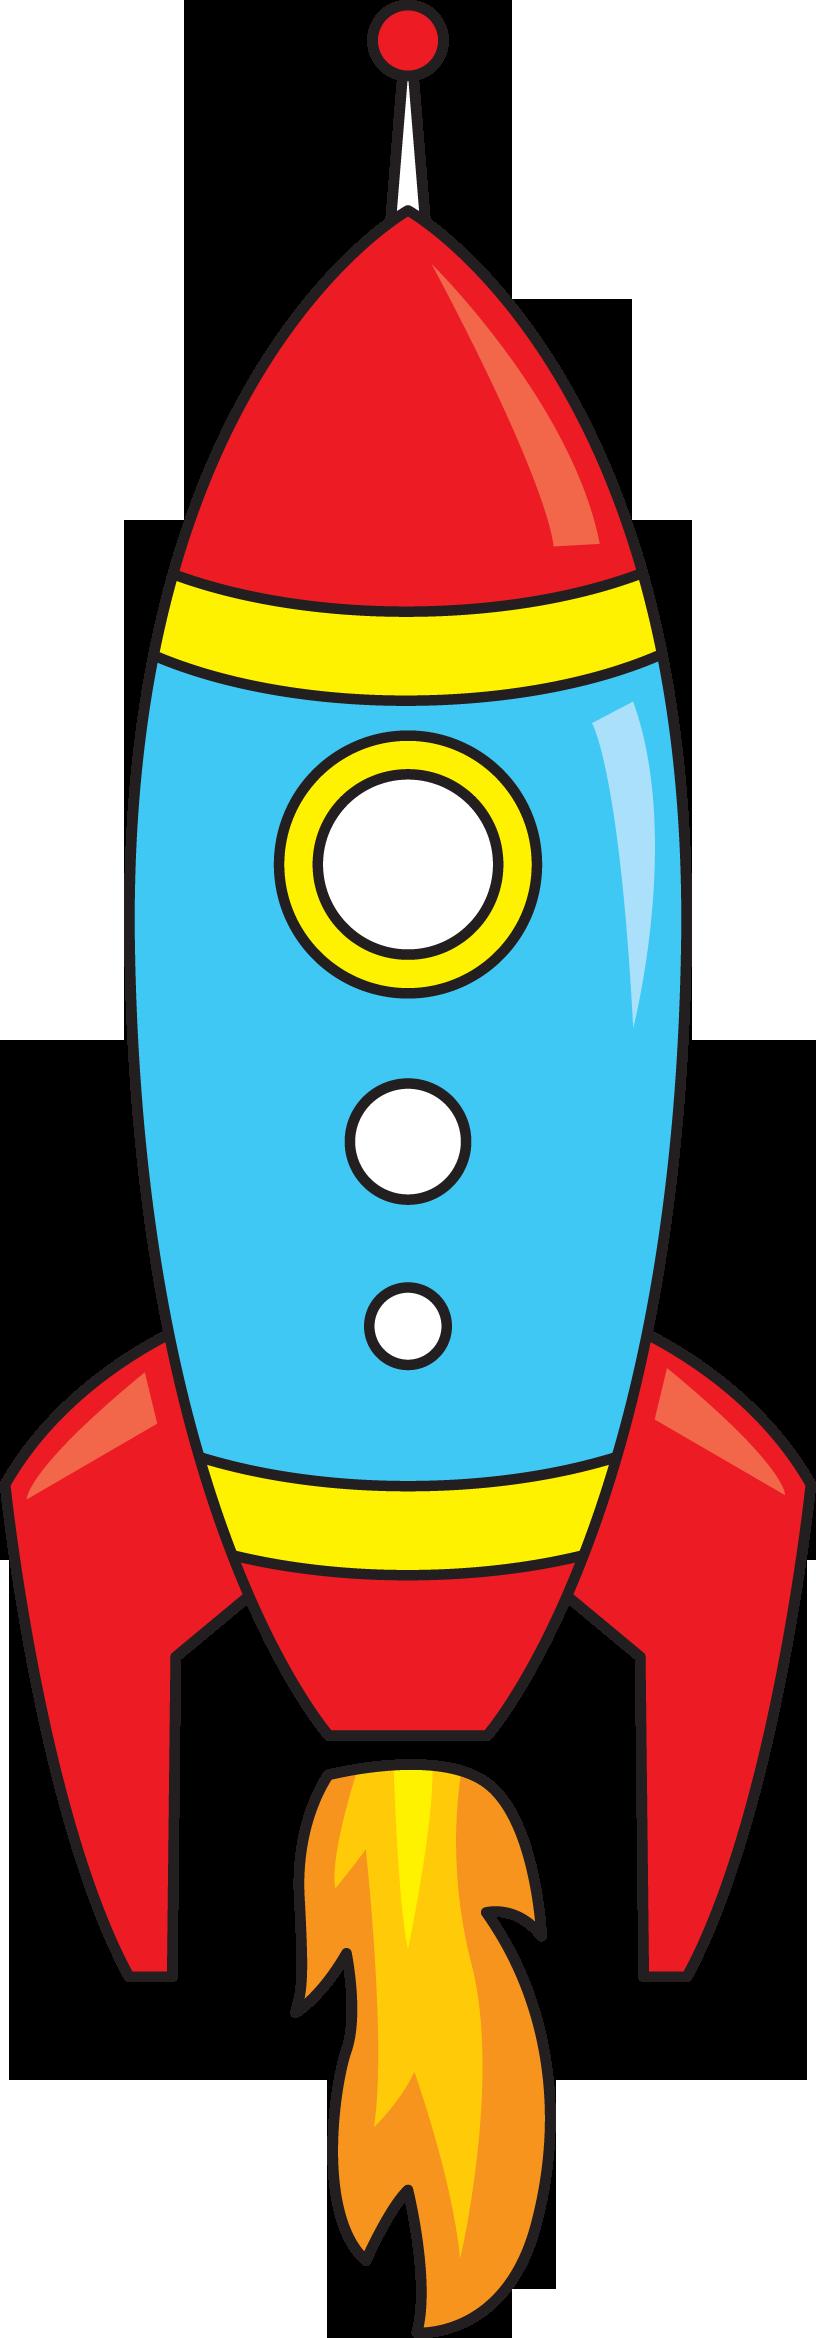 Space rocket clip art pics about space